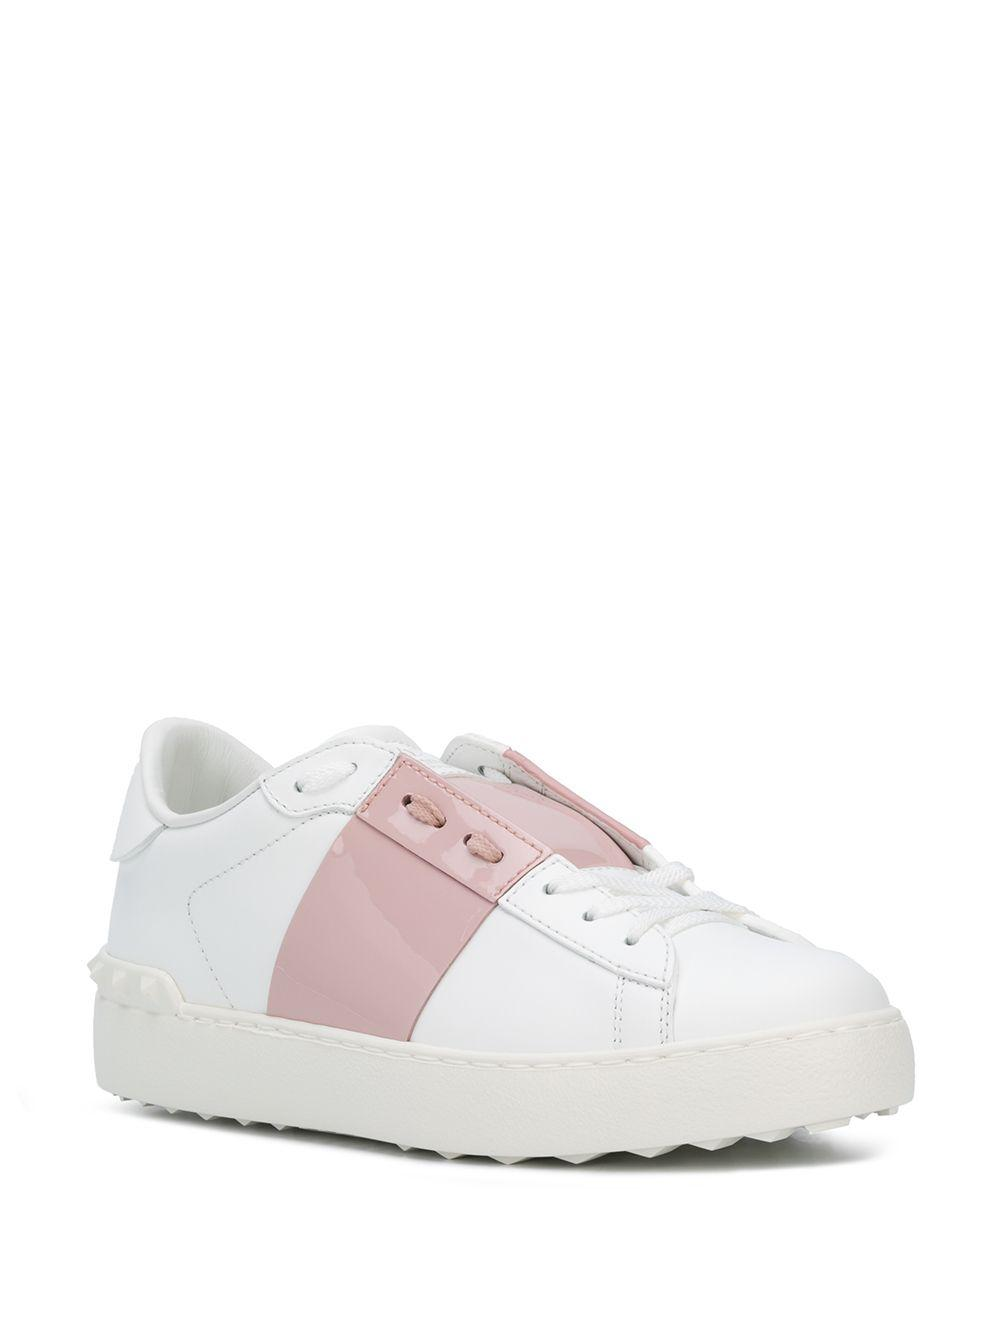 Valentino Garavani Leather White \u0026 Pink